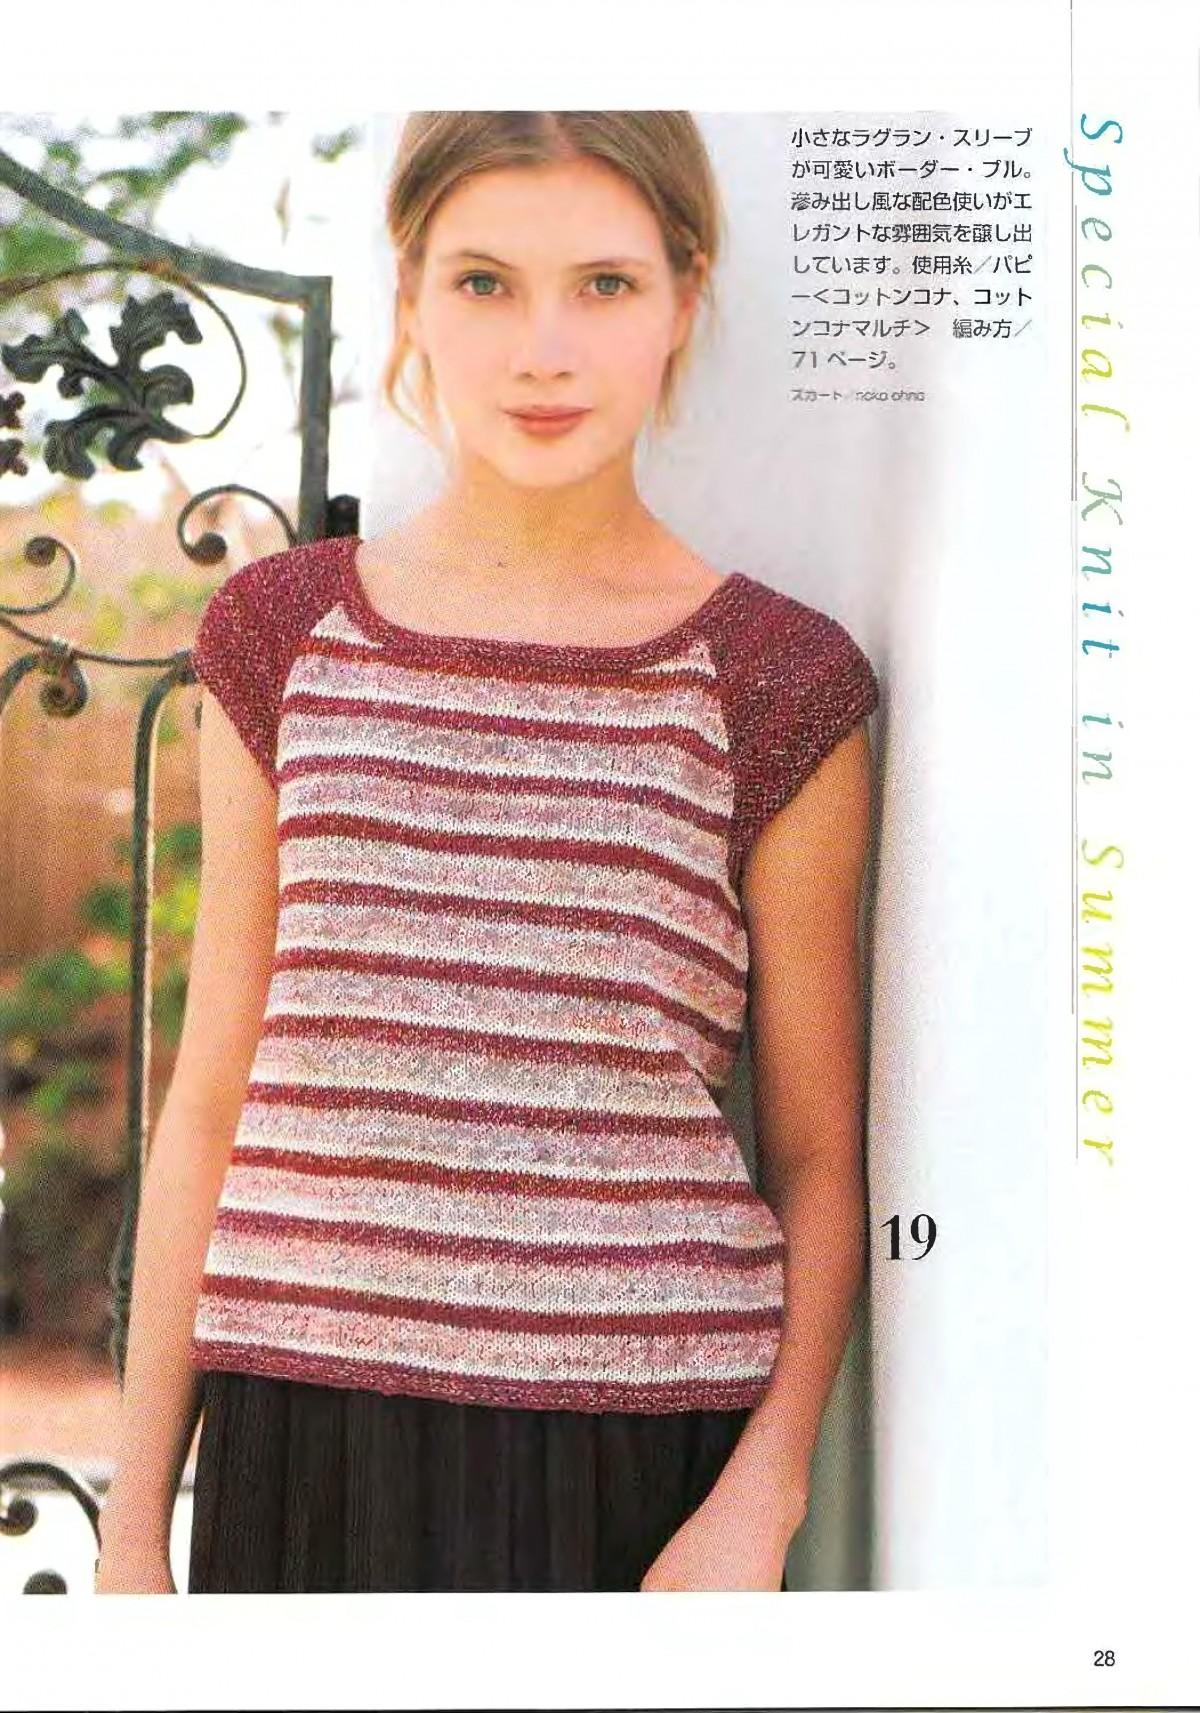 Lets-knit-series-NV4359-2008-Spring-Summer-sp-kr_26.jpg